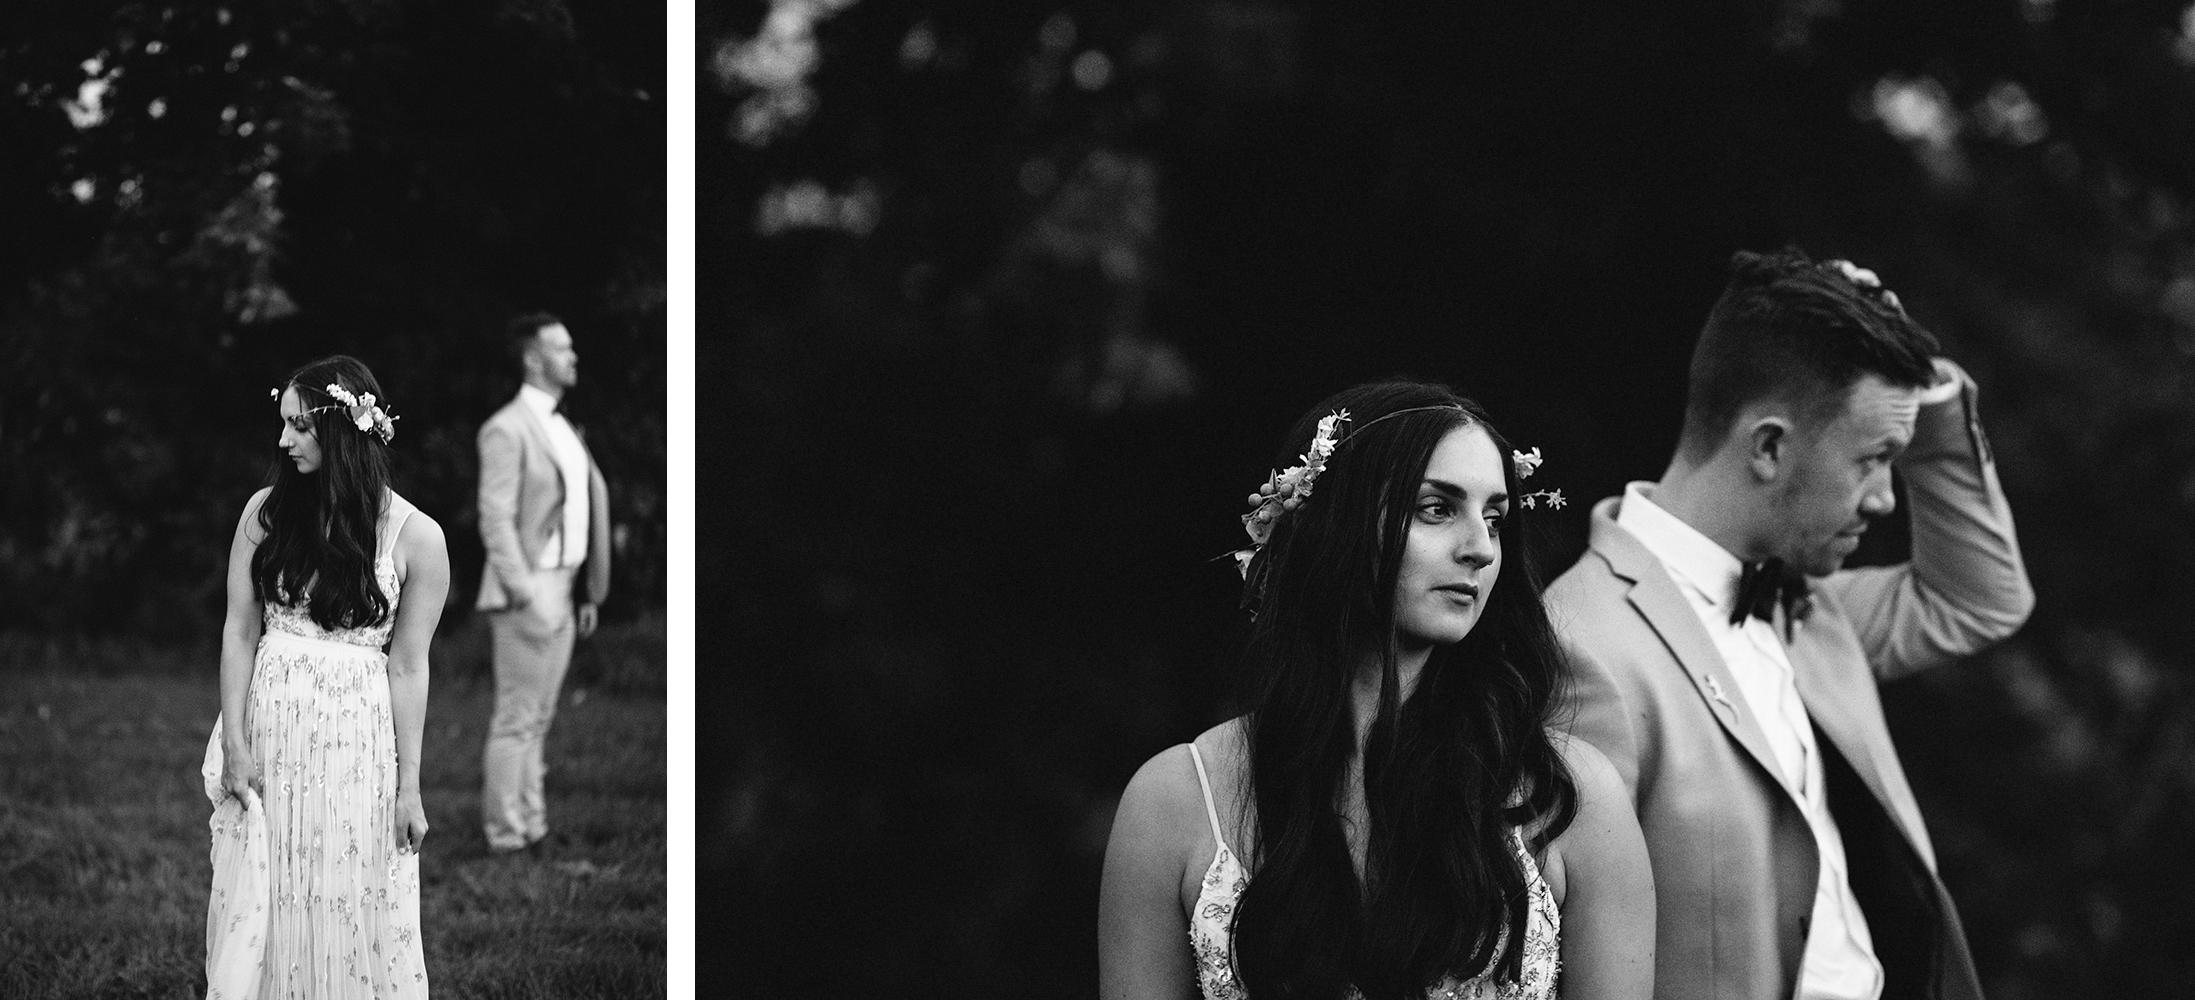 32-Backyard-toronto-film-photographer-ryanne-hollies-photography-analog-photography-torontos-best-wedding-photographers-night-portraits-bride-and-groom-candid-intimate-moody-dark-romantic-under-tree-trendy-alternative.jpg